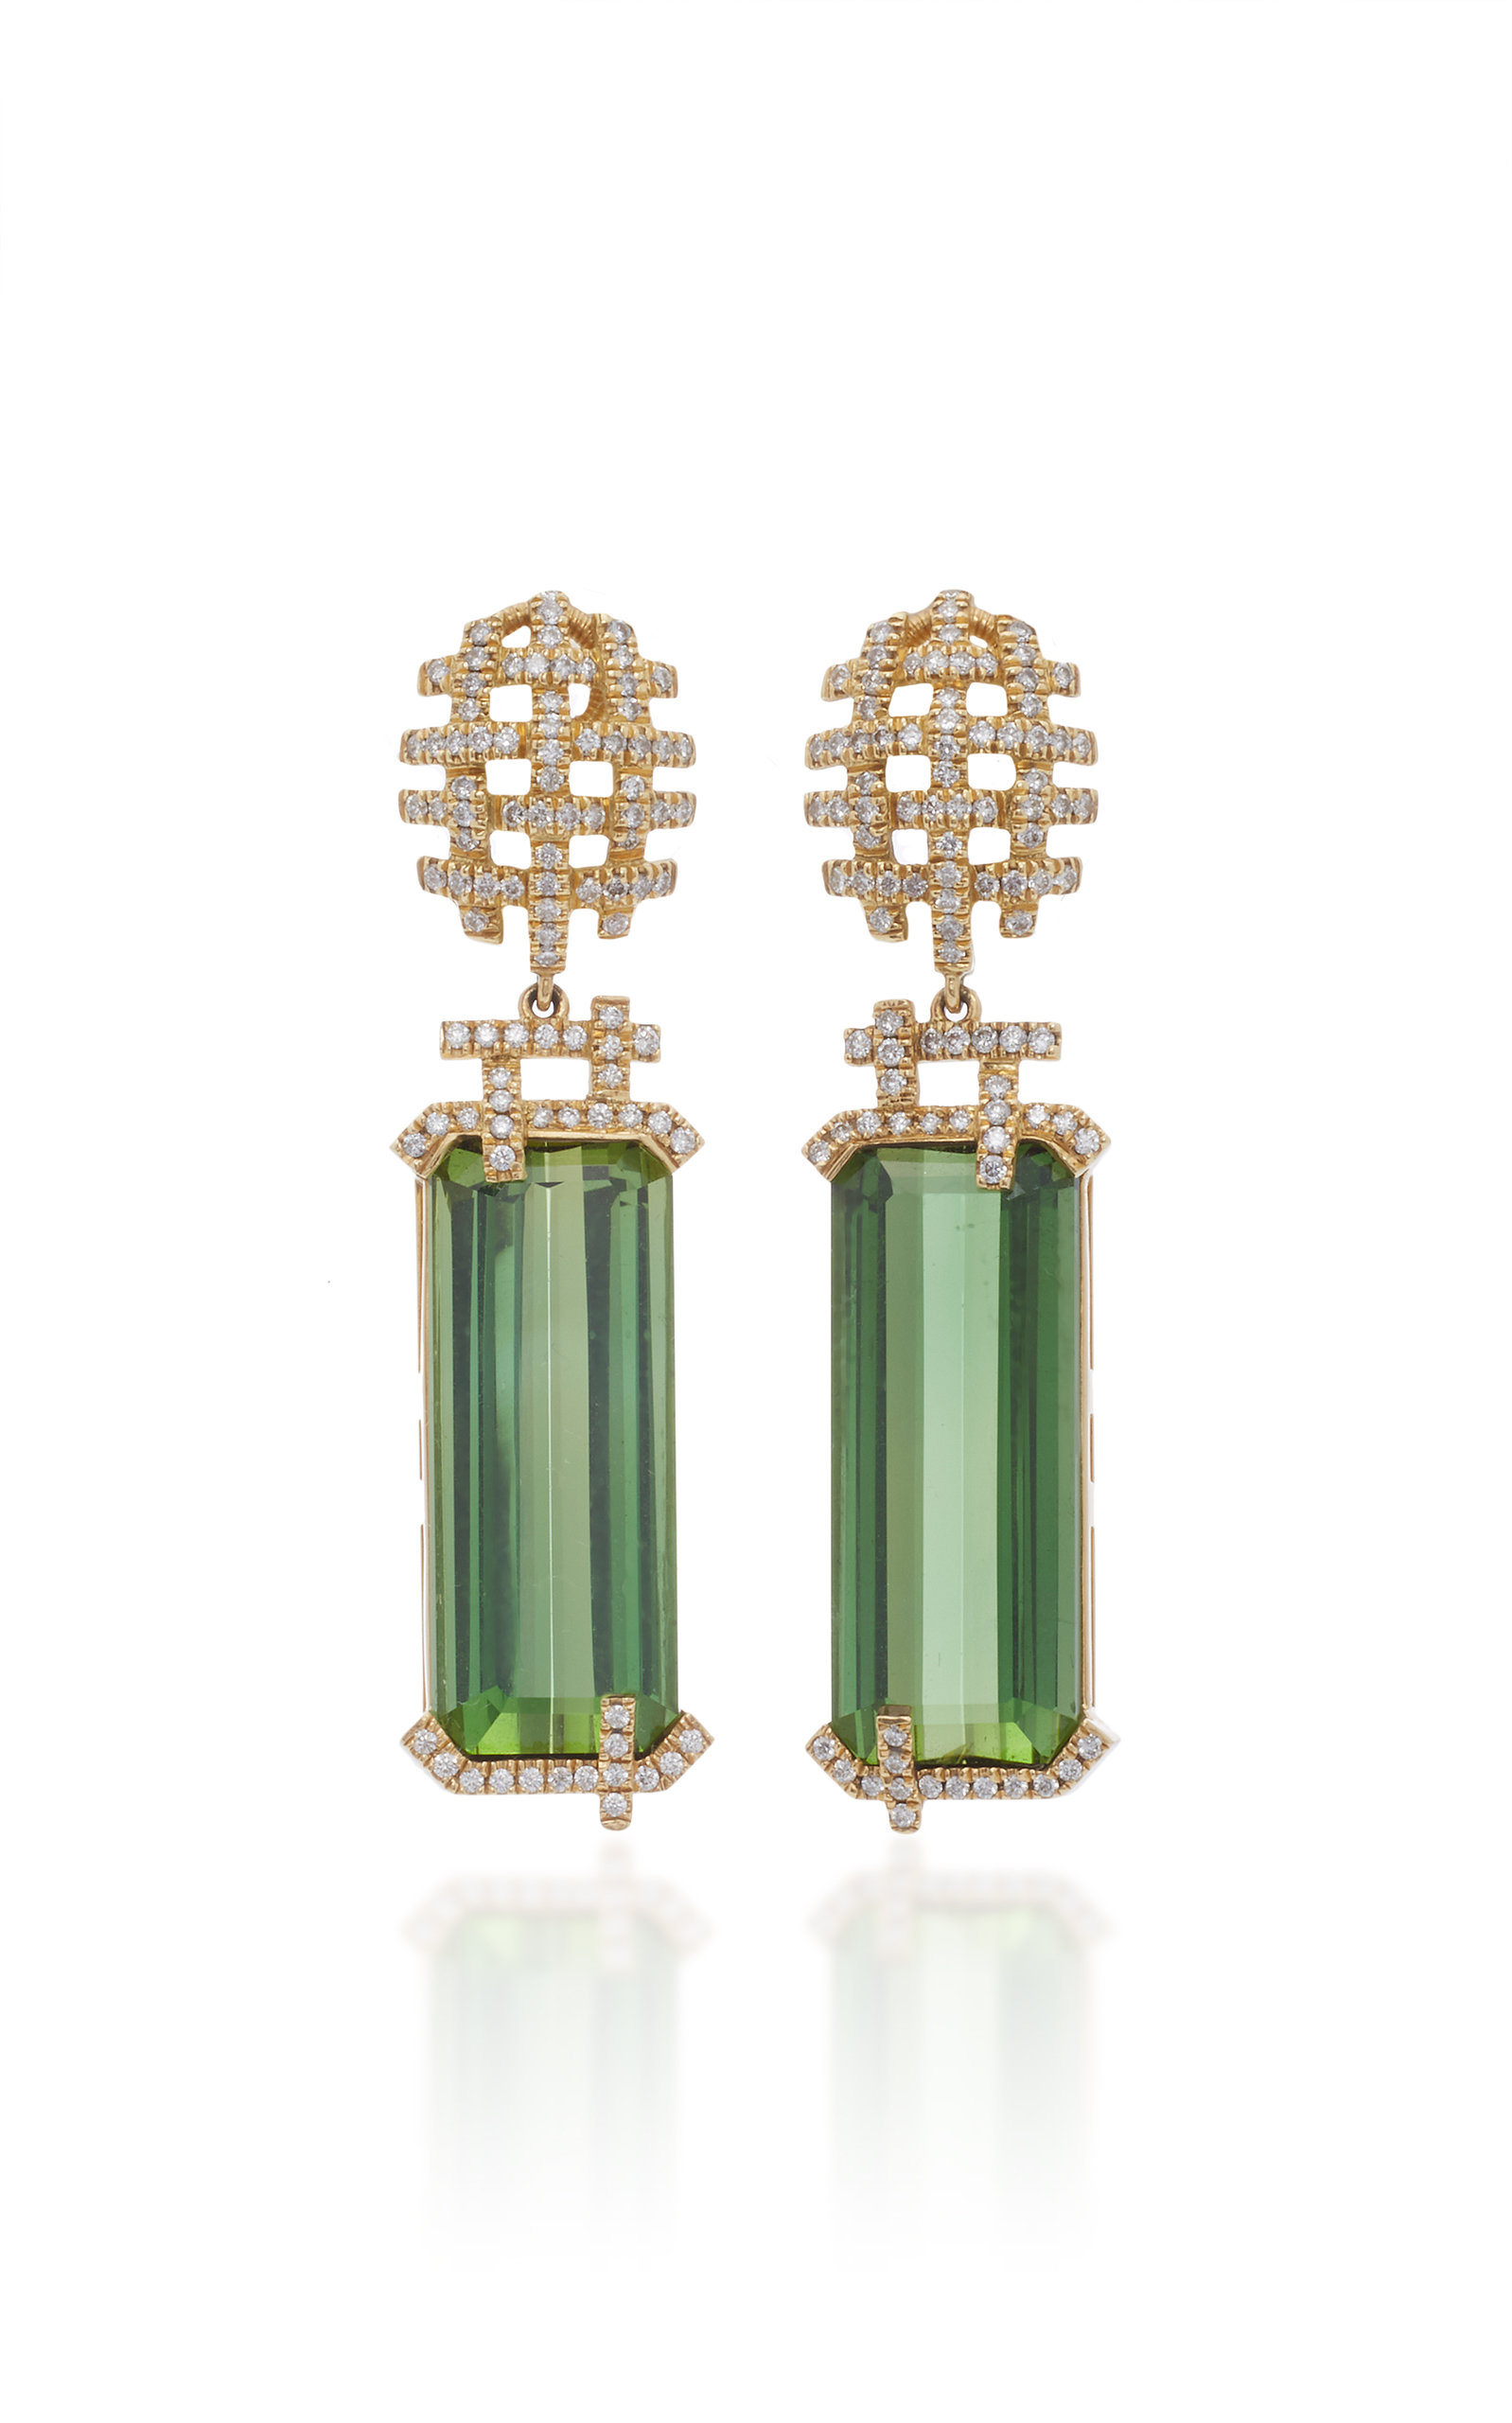 GOSHWARA 18K Gold Touramline And Diamond Earrings in Green